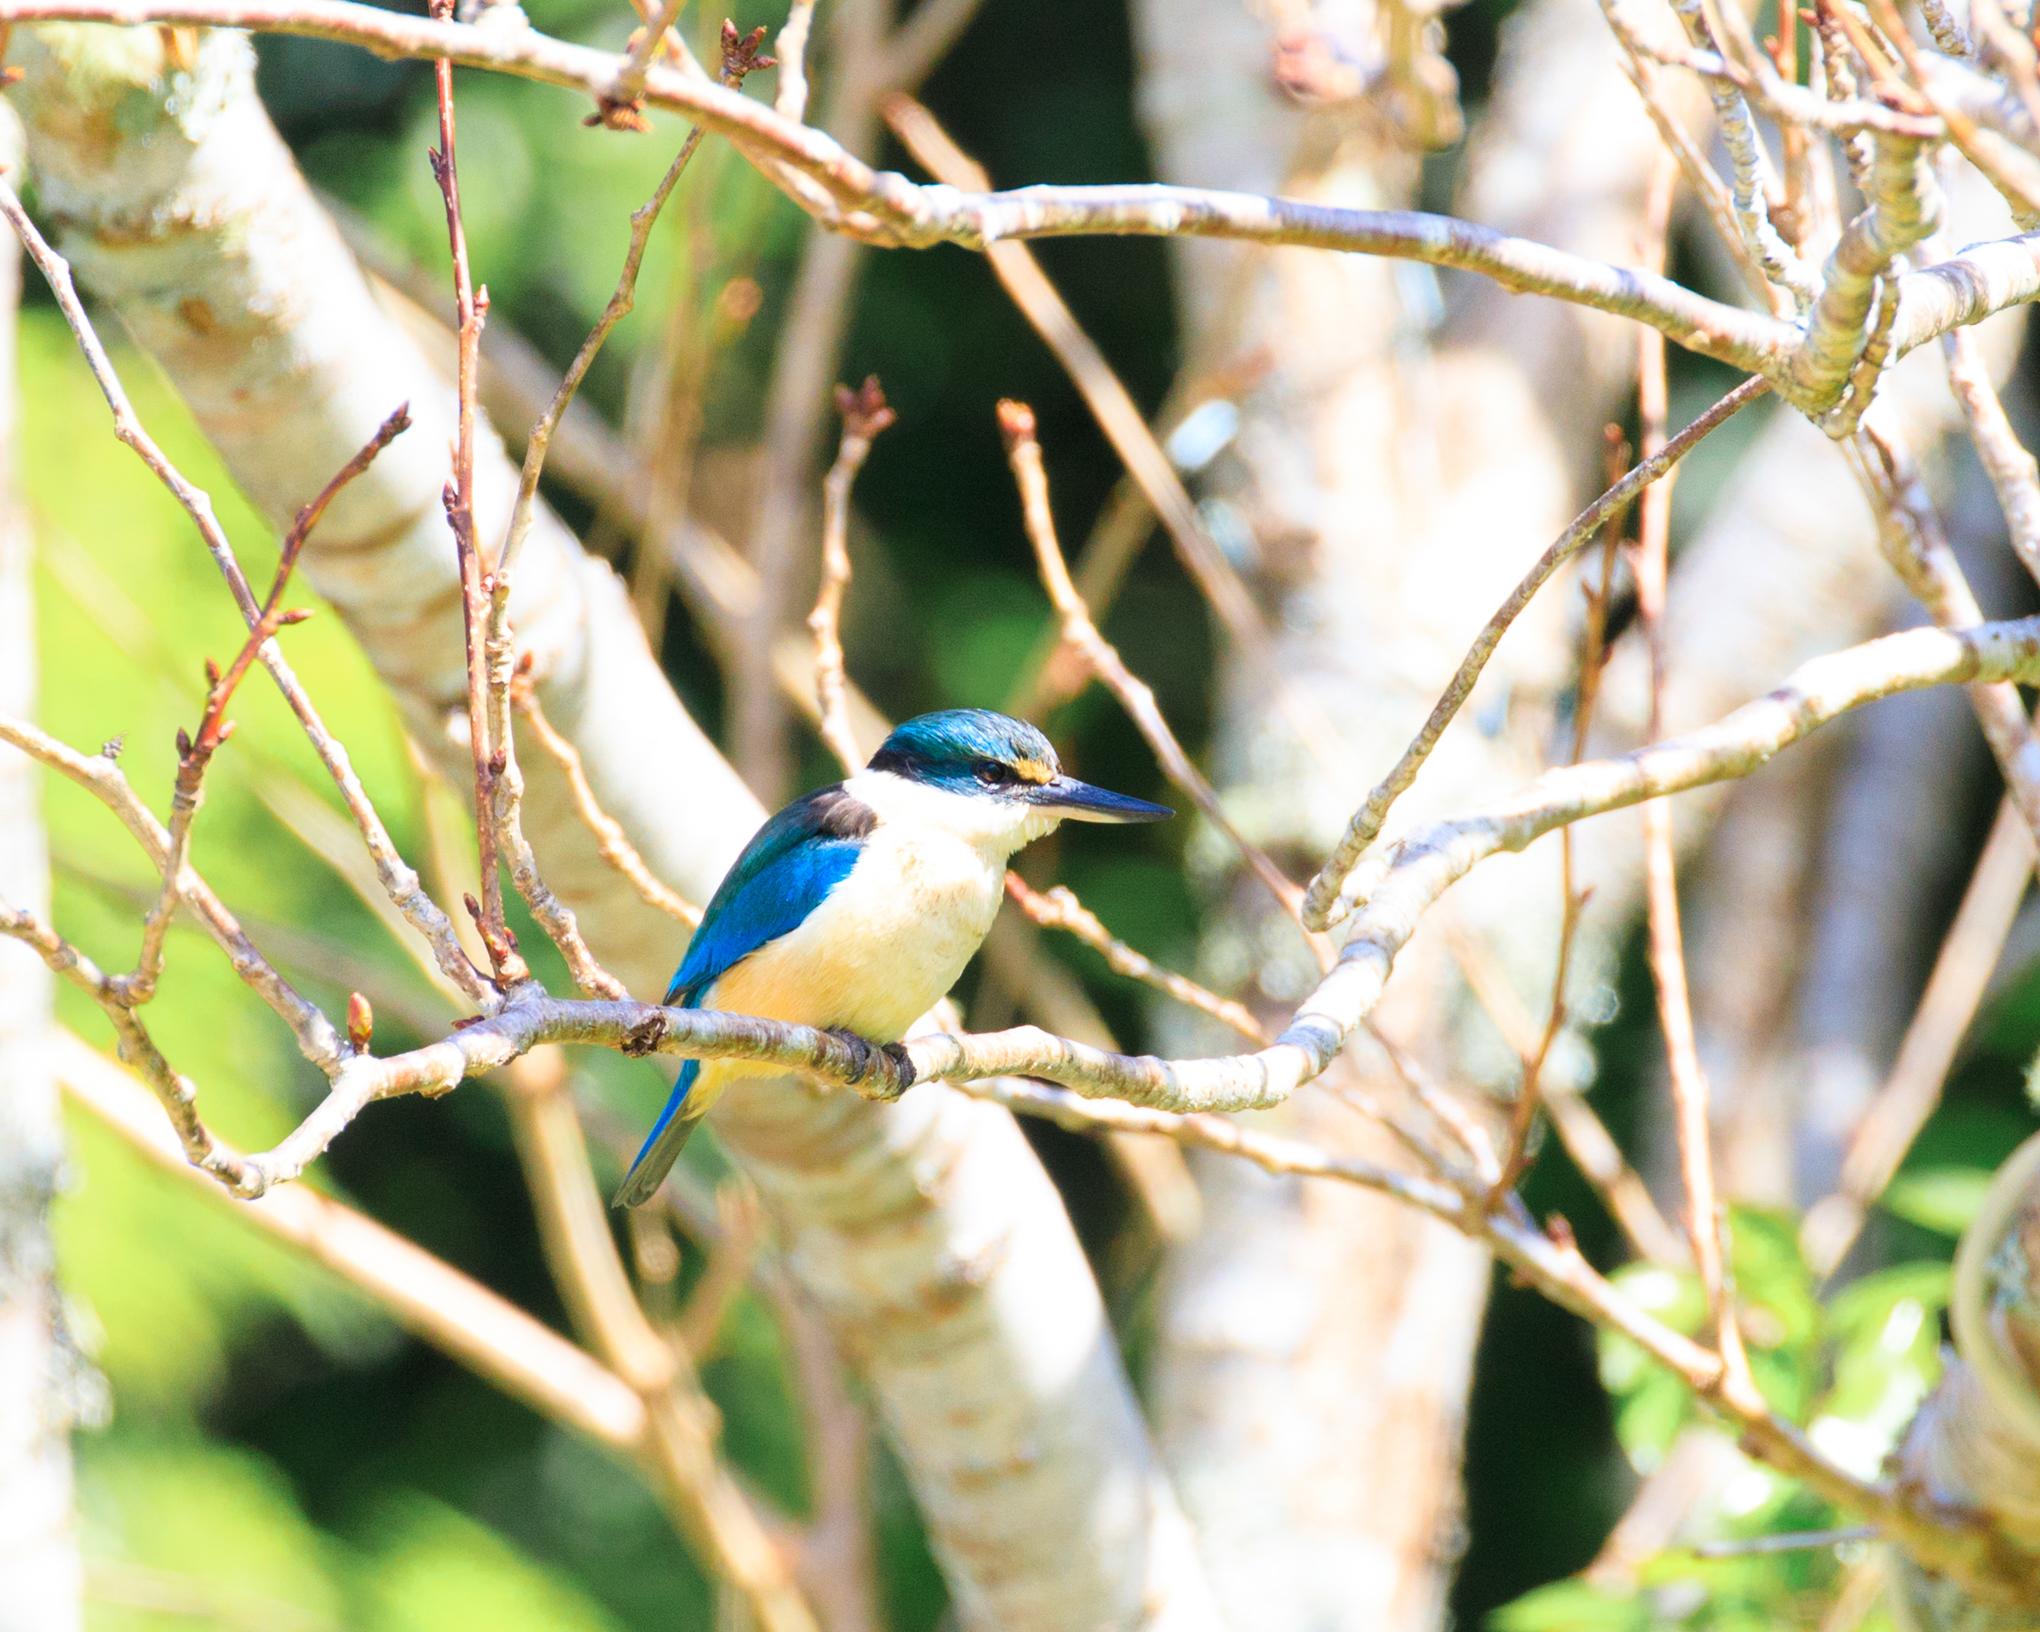 Kingfisher (which were abundant on the island)